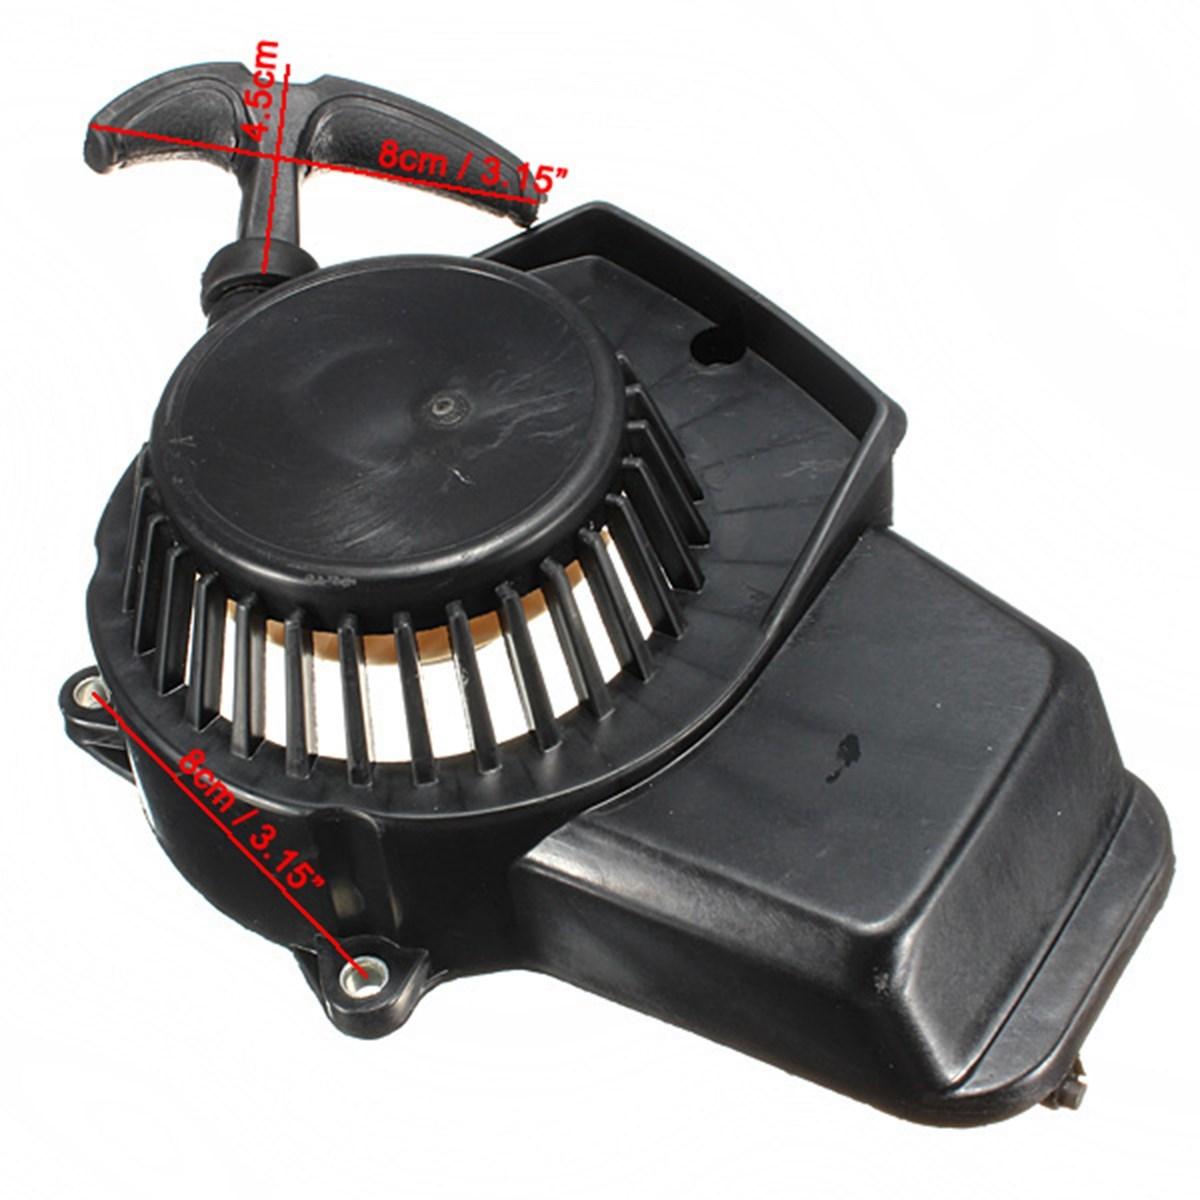 Audew 47cc 49cc Pit Dirt Bike Minimoto Mini Quad Pull Start Starter Cord Pullstart Cog(China (Mainland))